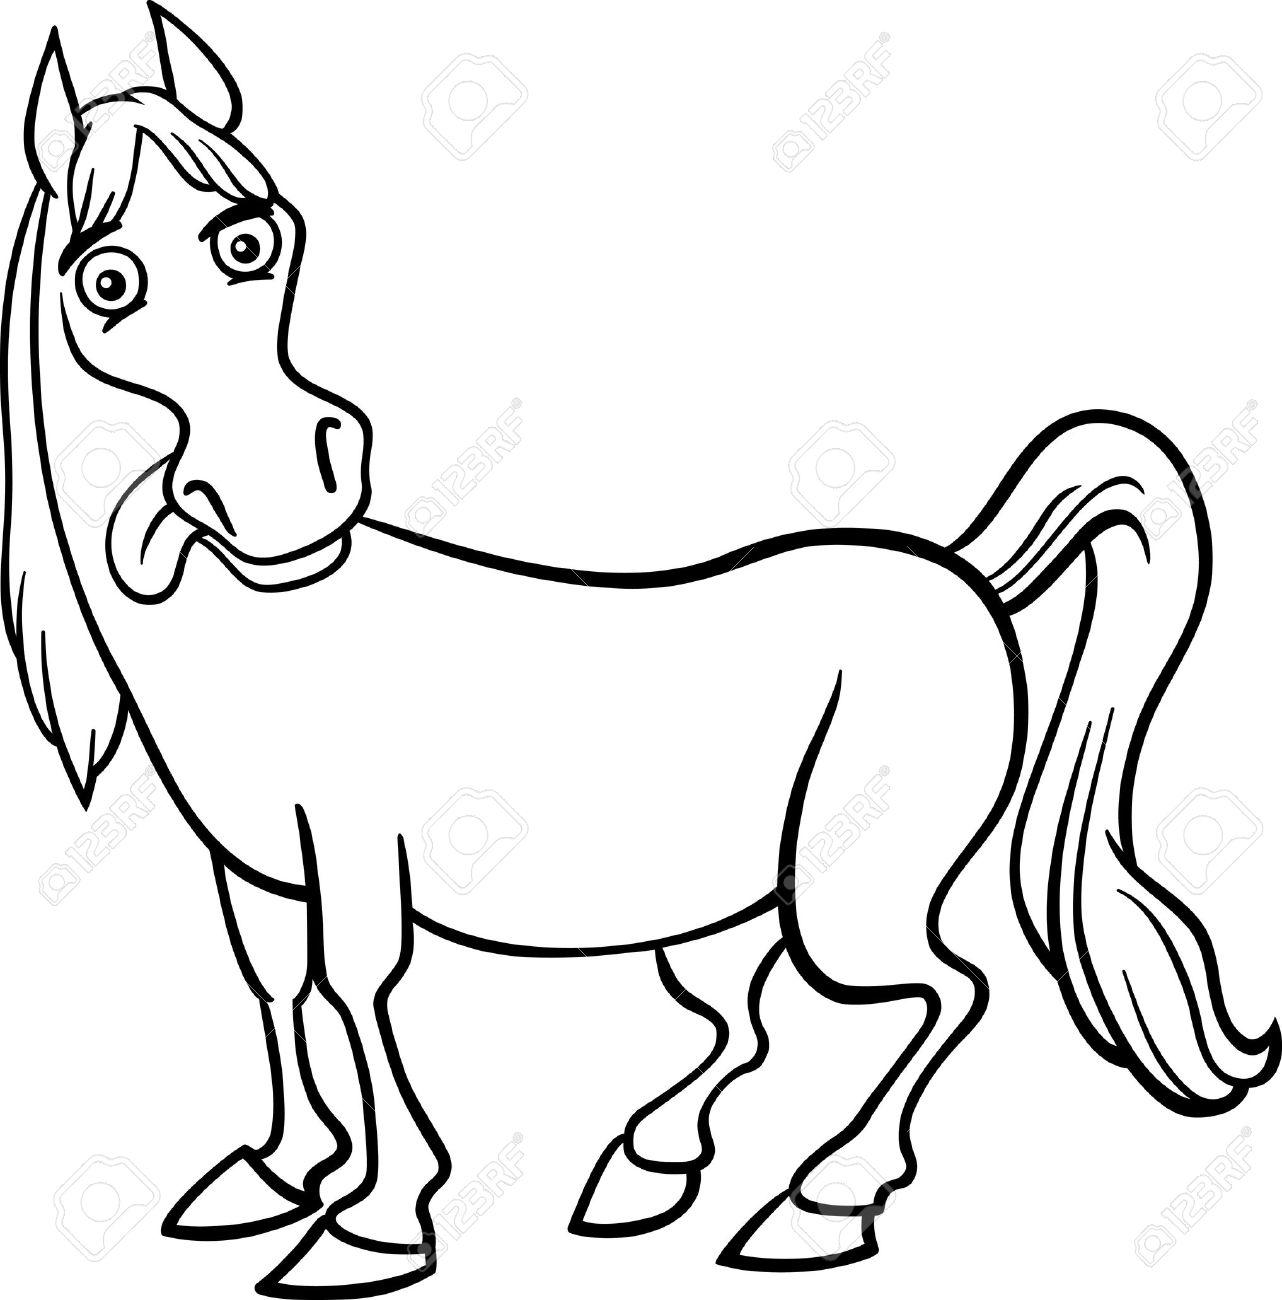 black and white cartoon illustration of funny horse farm animal